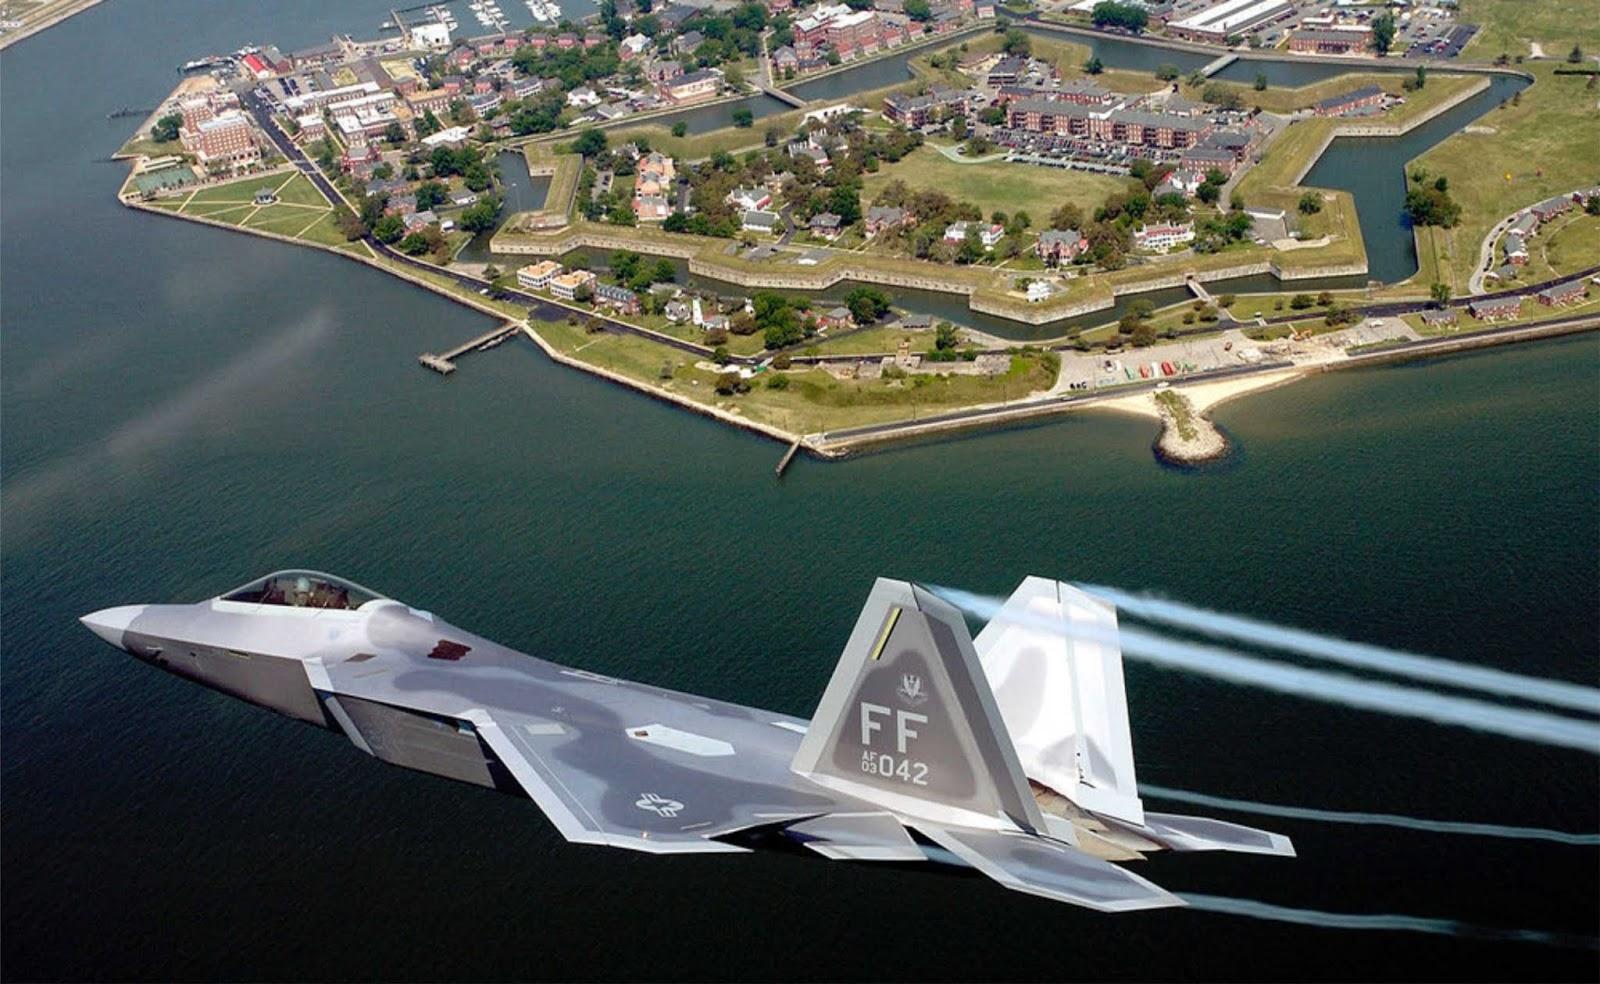 Pangkalan udara yang sudah usang akan mengurangi tingkat kesiapan tempur Angkatan Udara